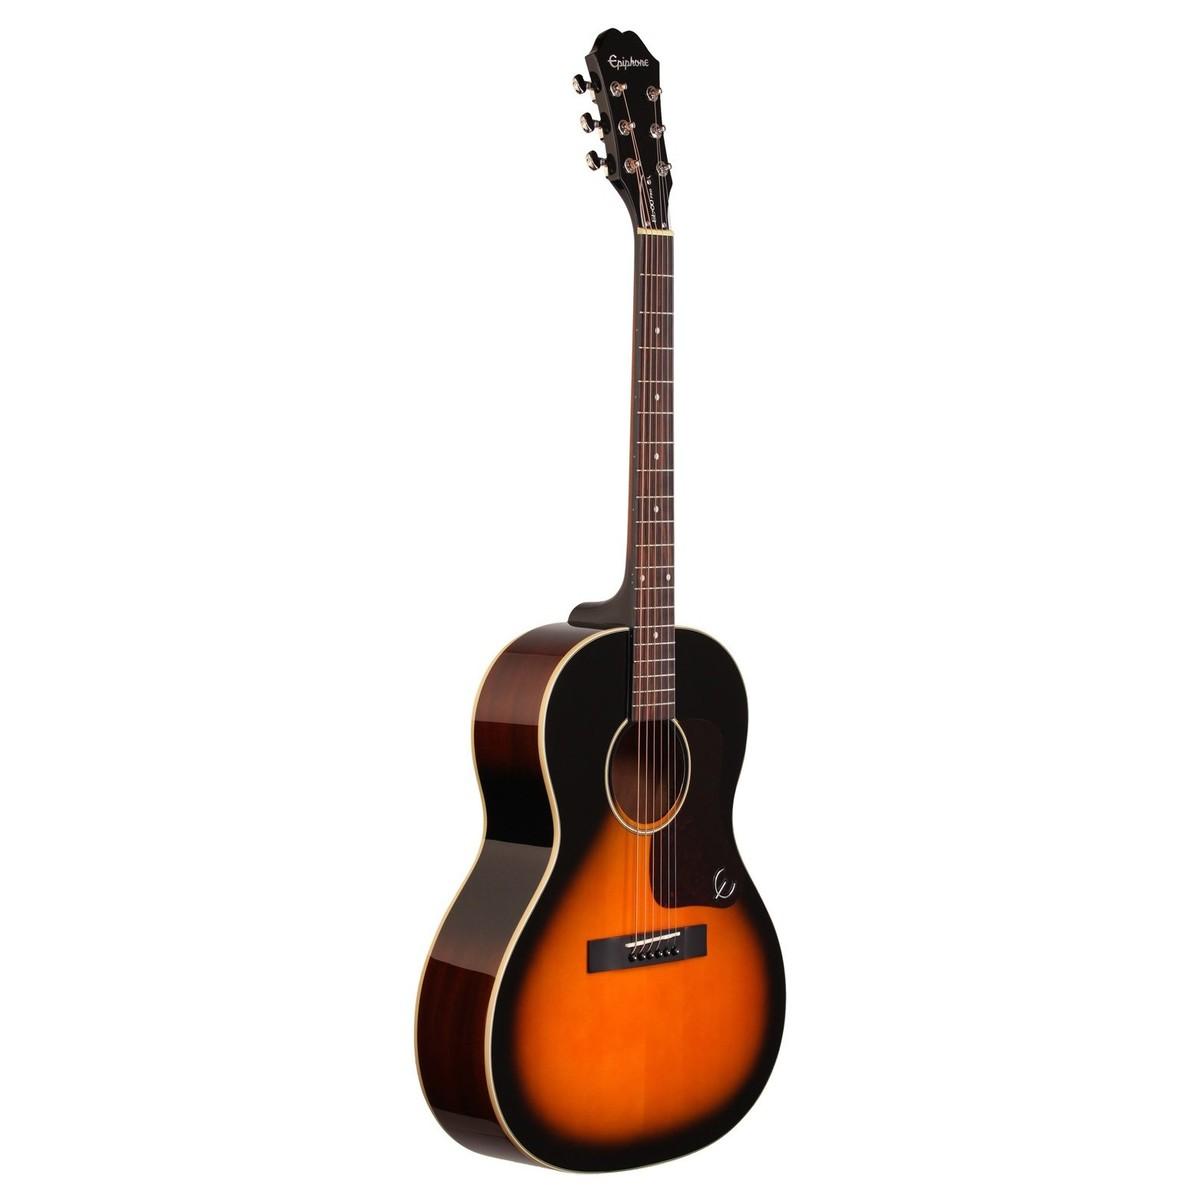 epiphone el 00 pro guitare electro acoustique vintage. Black Bedroom Furniture Sets. Home Design Ideas